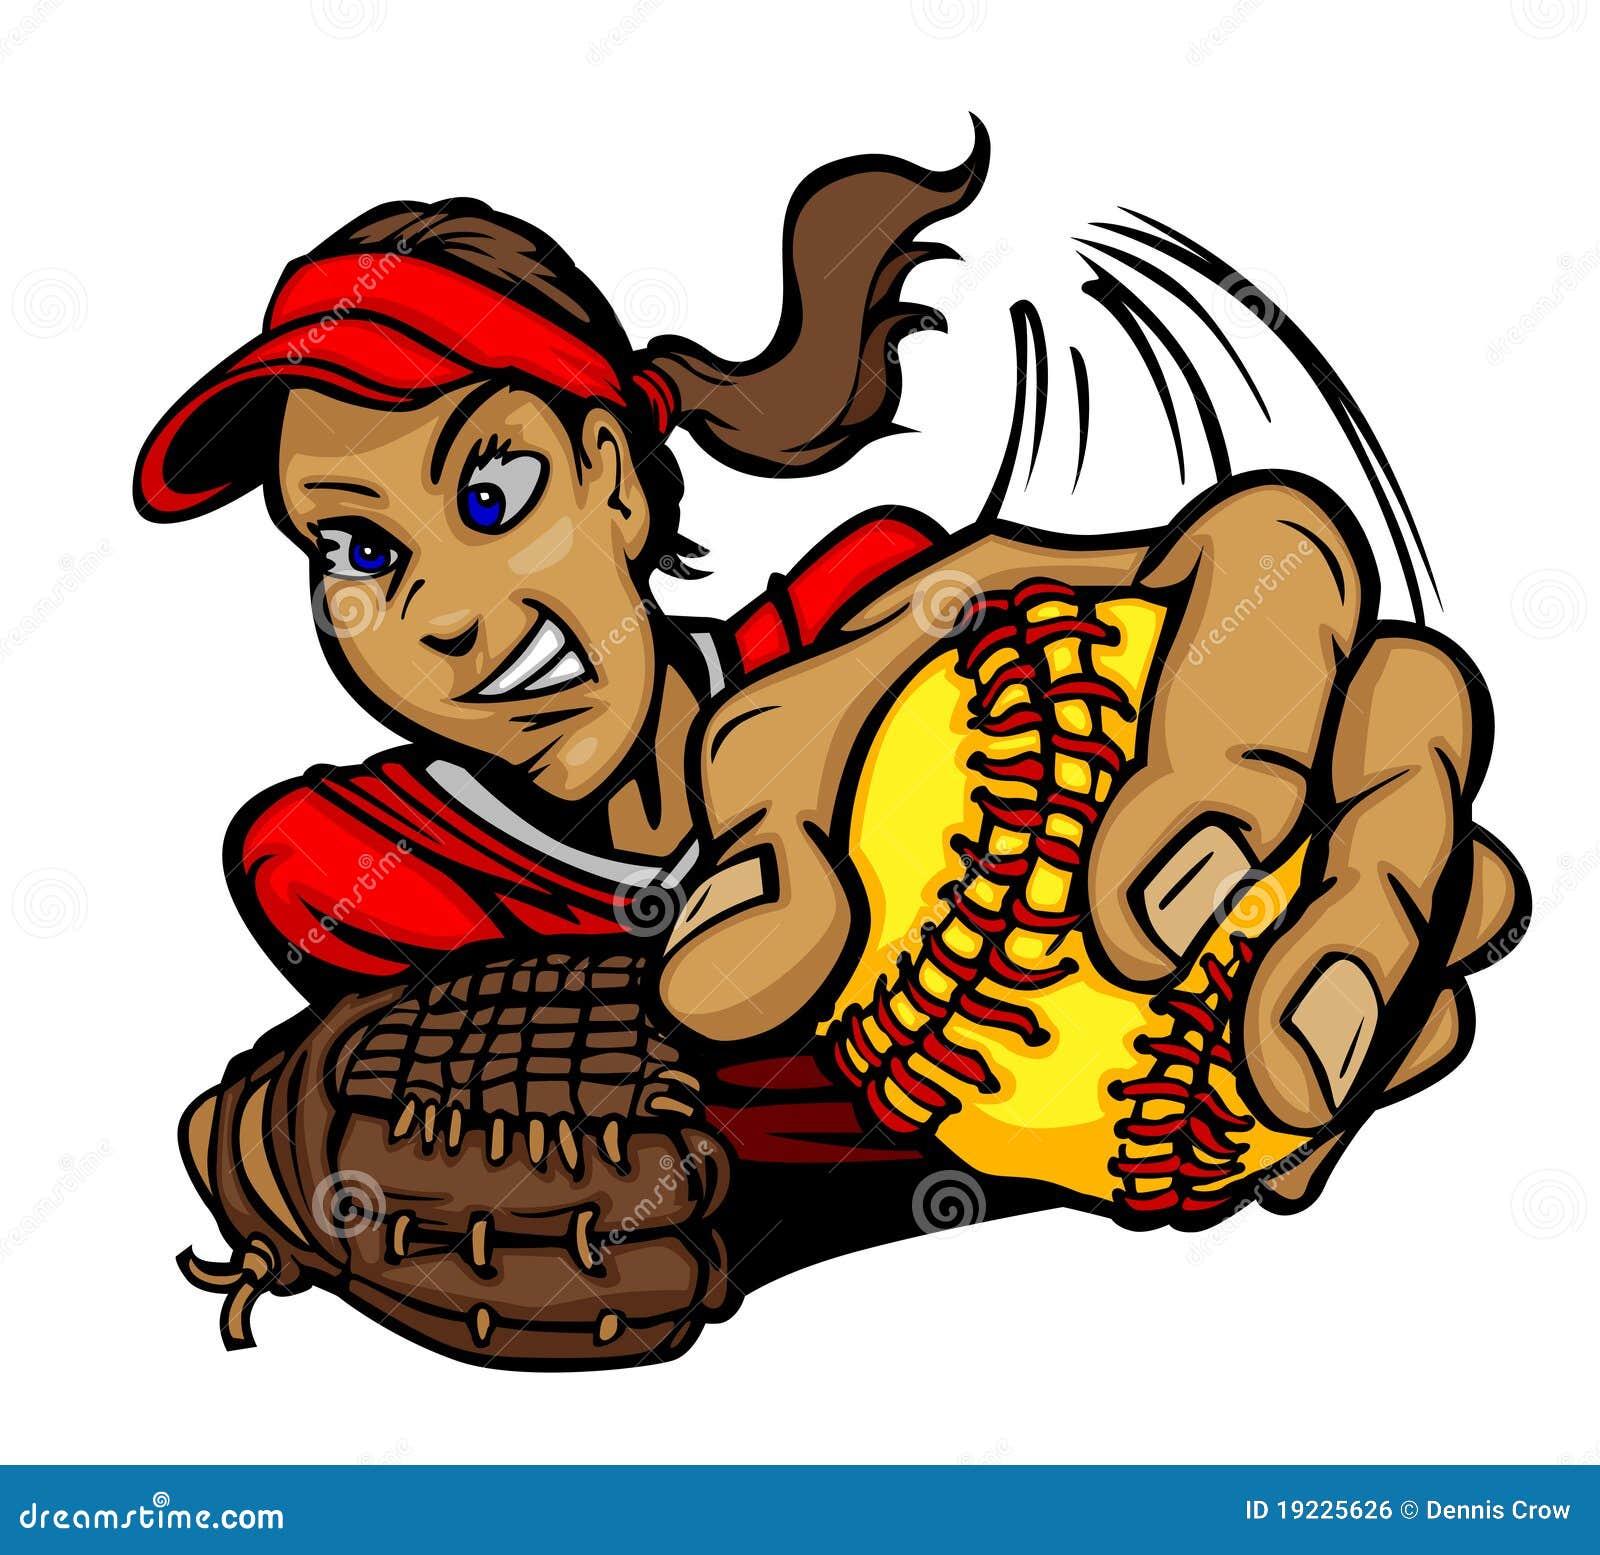 Fastpitch Softball Girl Cartoon Royalty Free Stock Image - Image ...